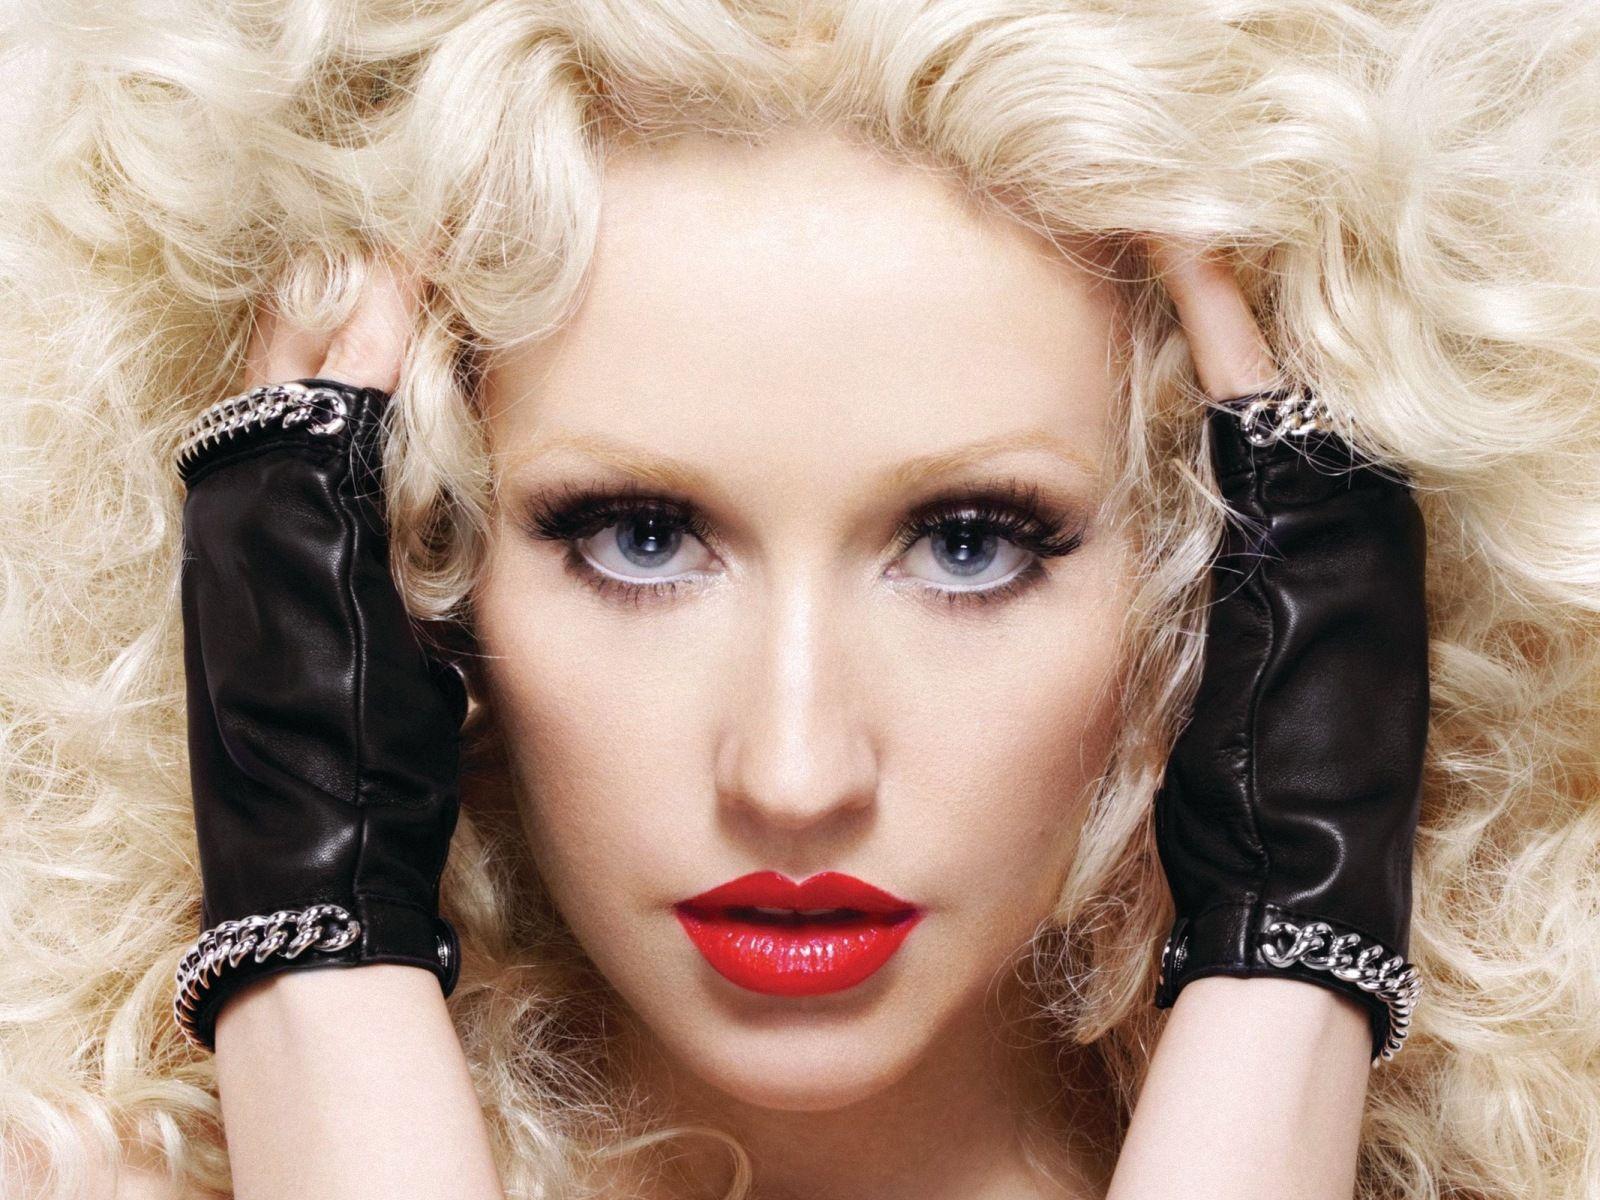 Christina Aguilera Bionic 3 1600x1200 Wallpapers 1600x1200 Wallpapers Pictures Free Do Christina Aguilera Bionic Christina Aguilera Christina Aguilera Young